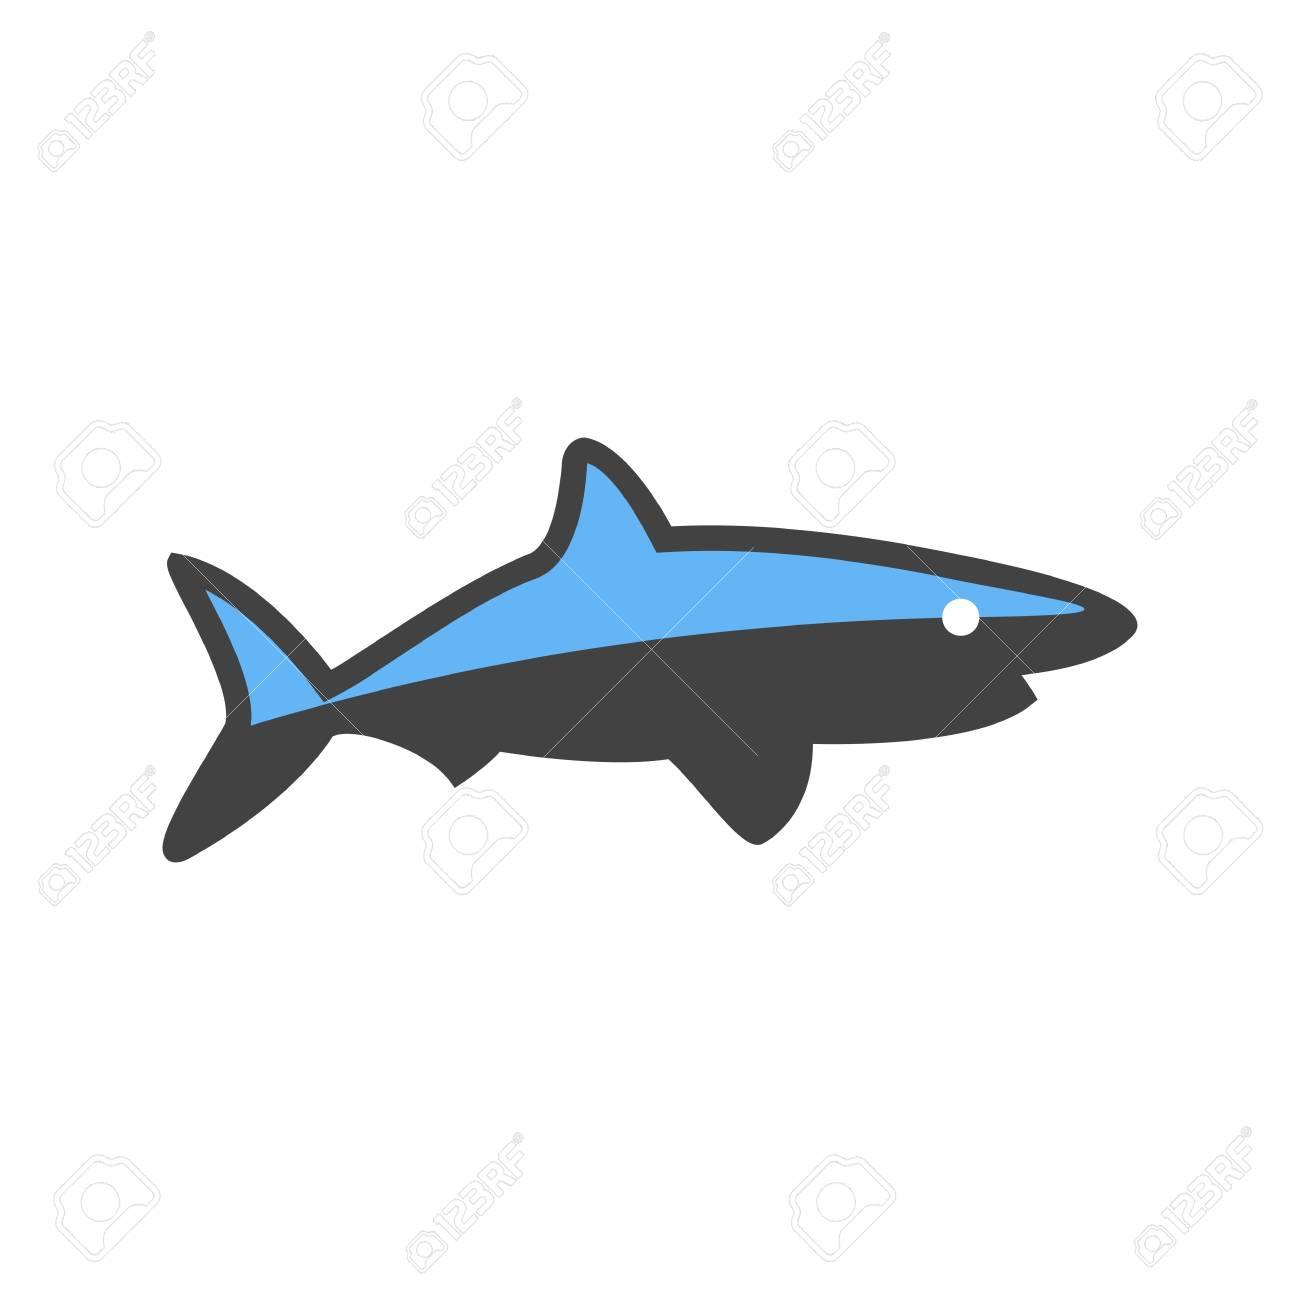 A Shark Vector illustration isolated on plain background.